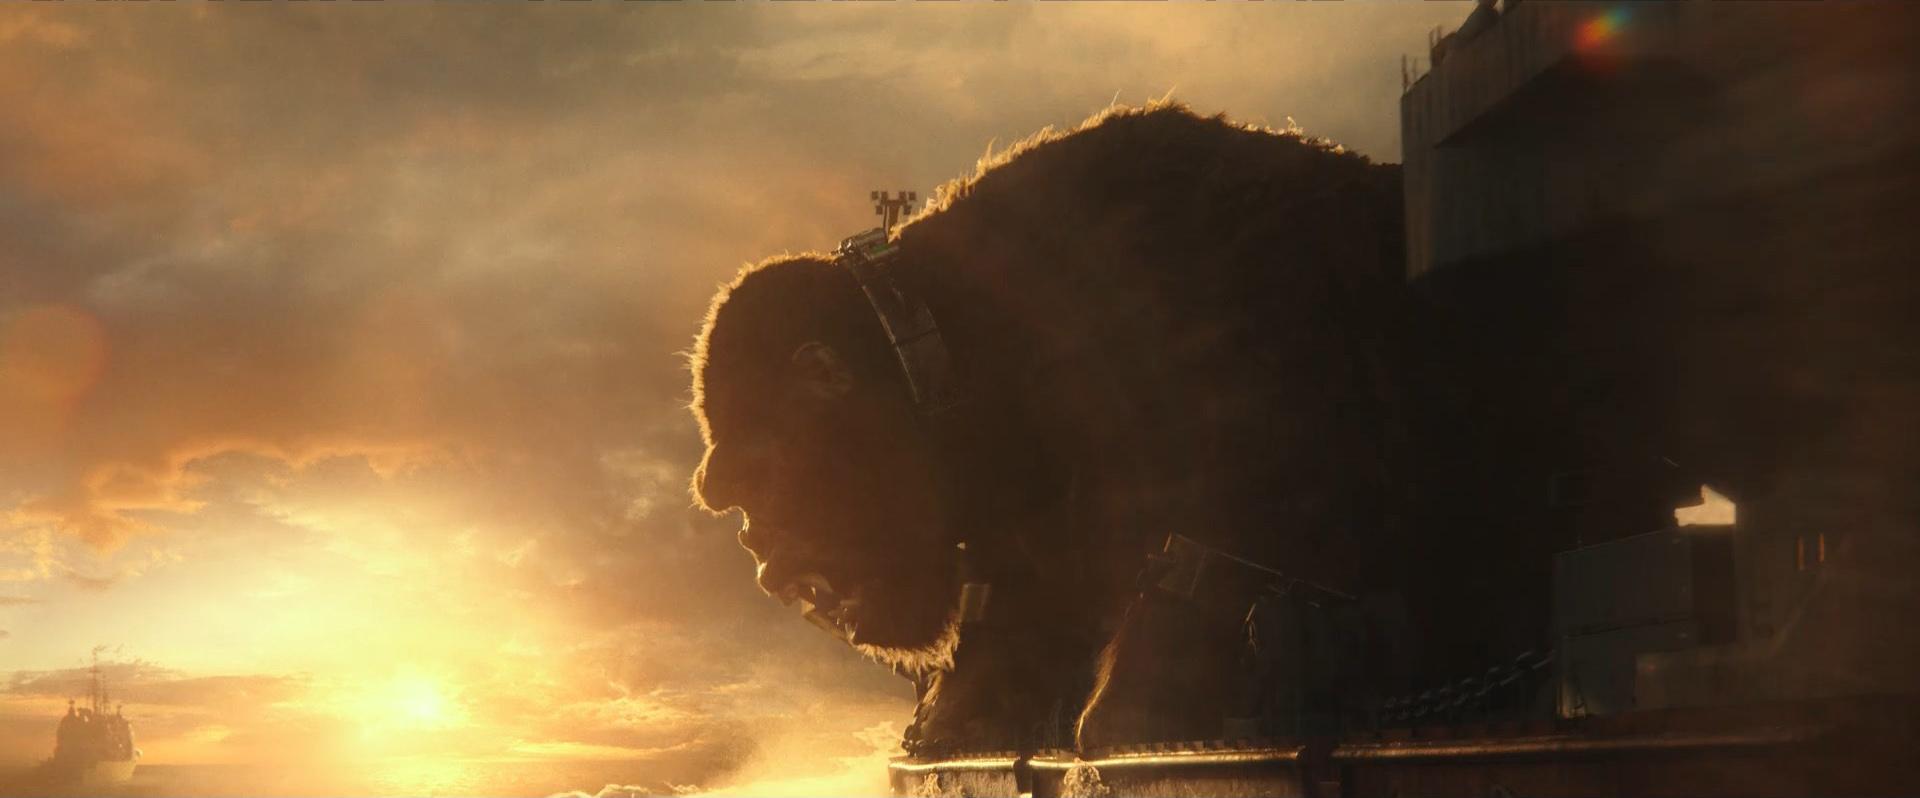 Godzilla vs Kong Trailer Still 35 - Kong awakens Godzilla